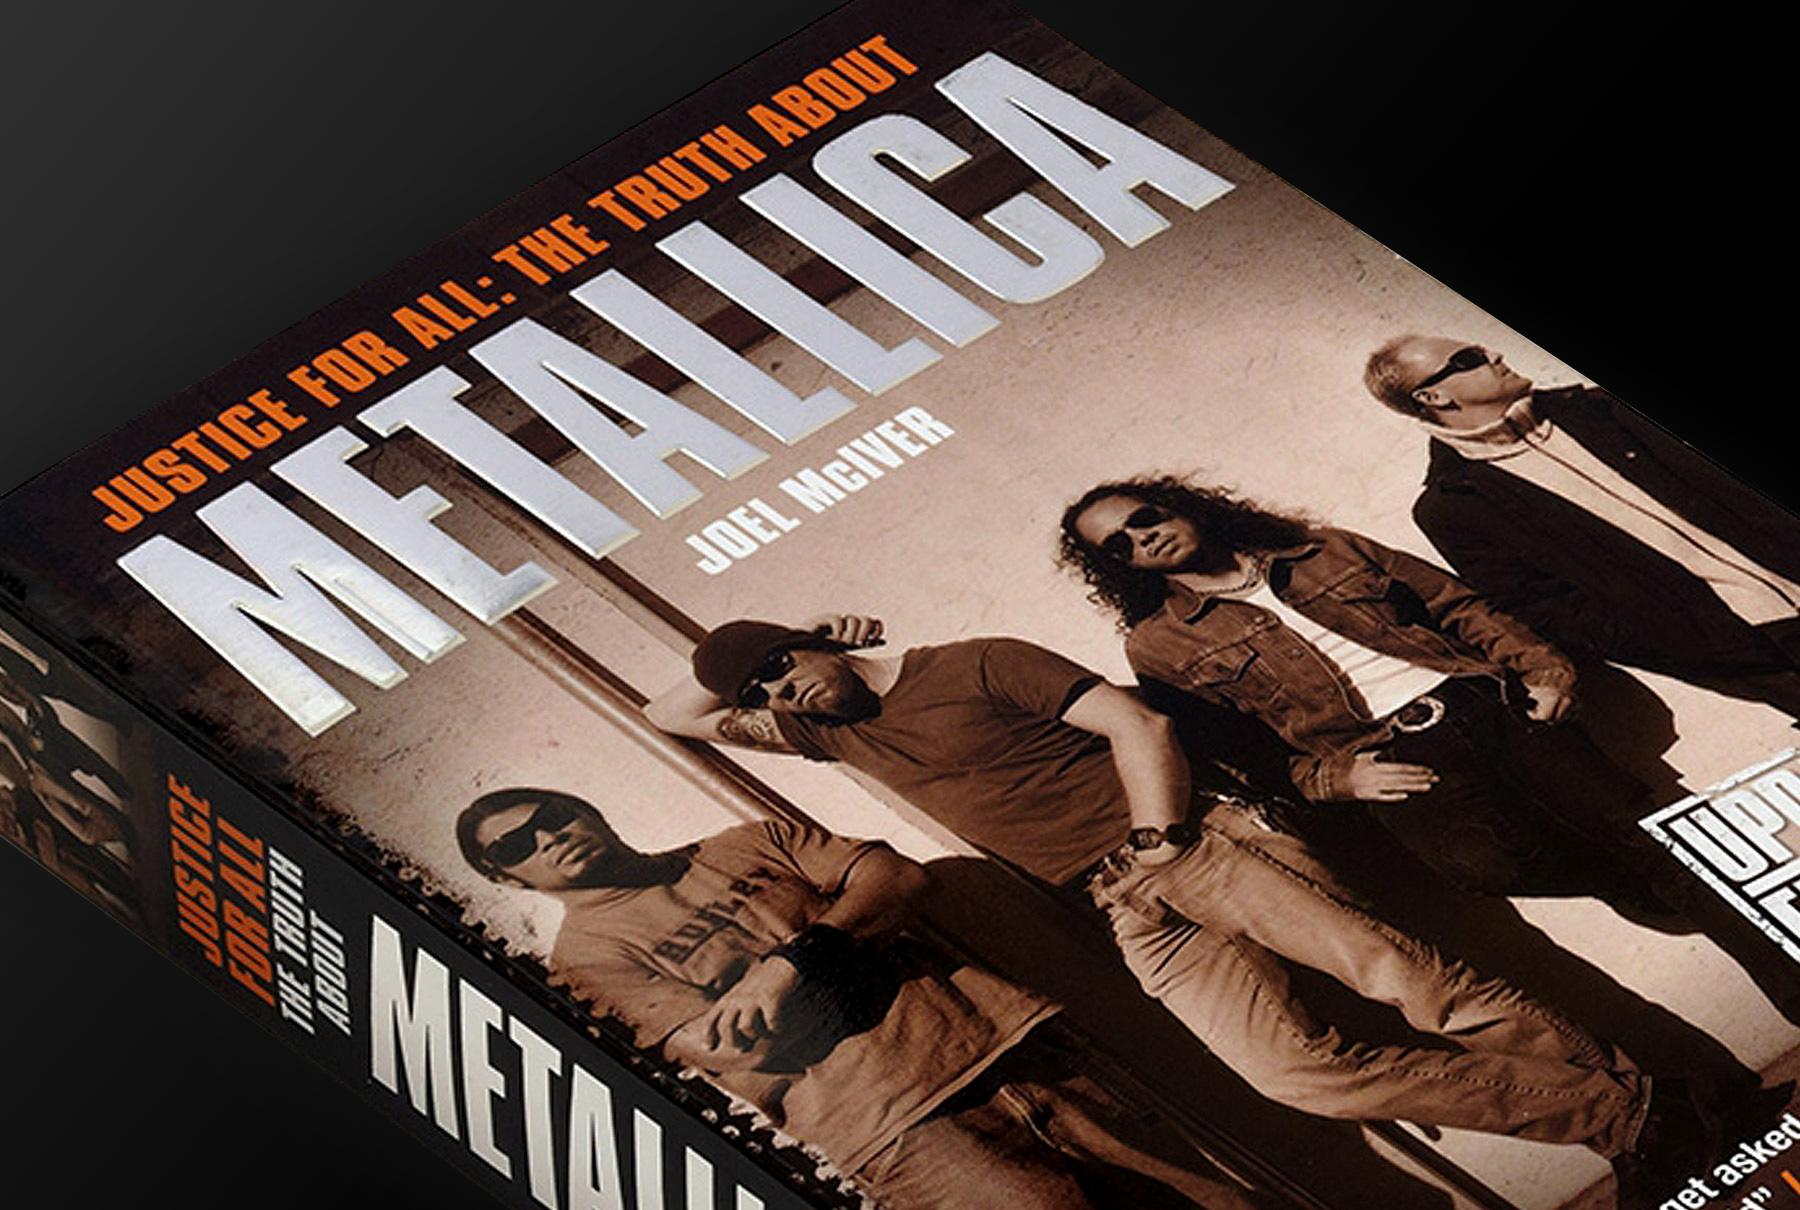 Metallica Cover Design